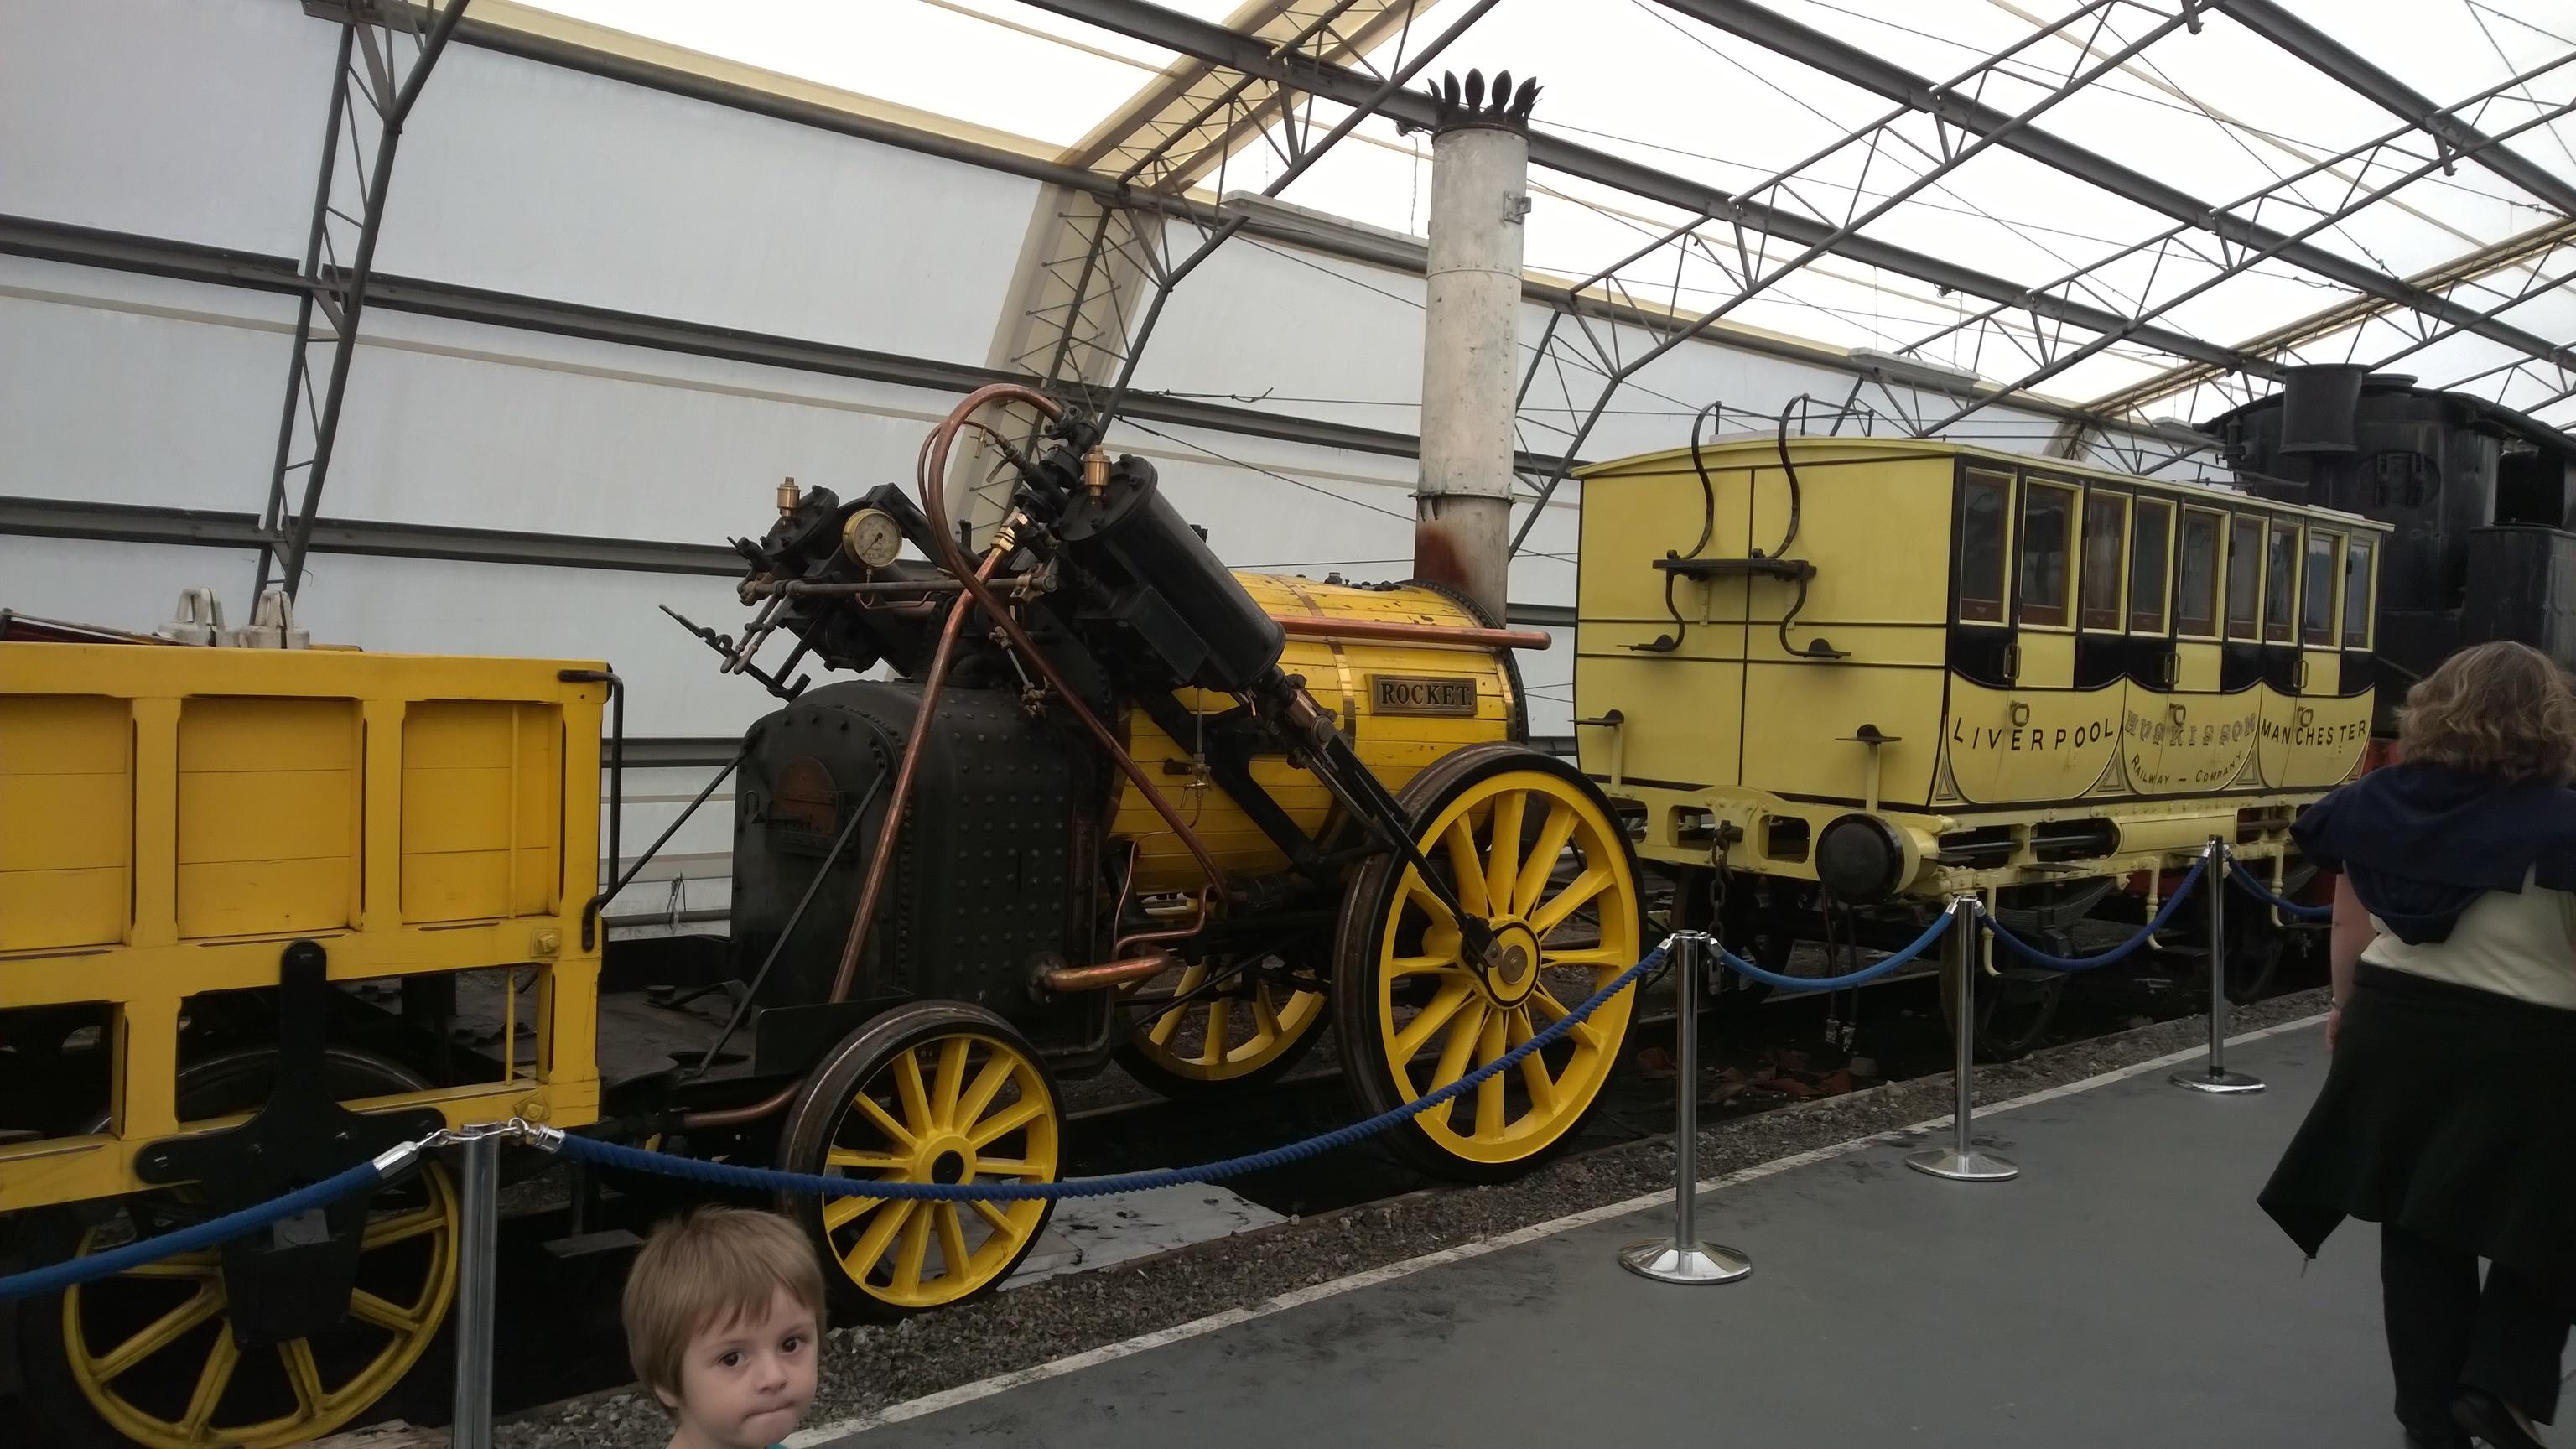 National Rail Museum, York